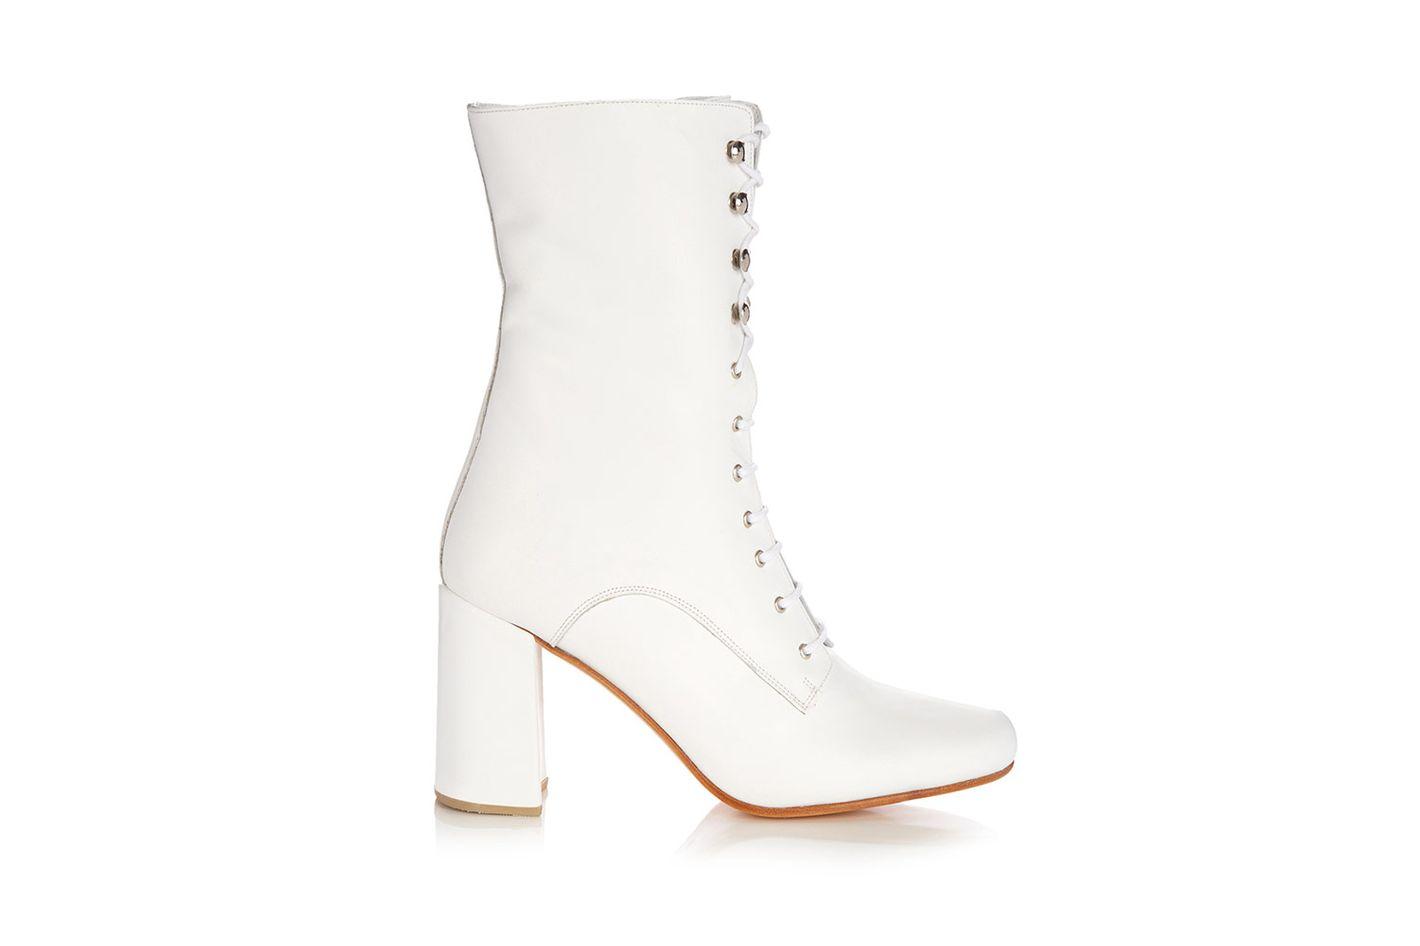 Maryam Nassir Zadeh 'Emmanuelle' Boots